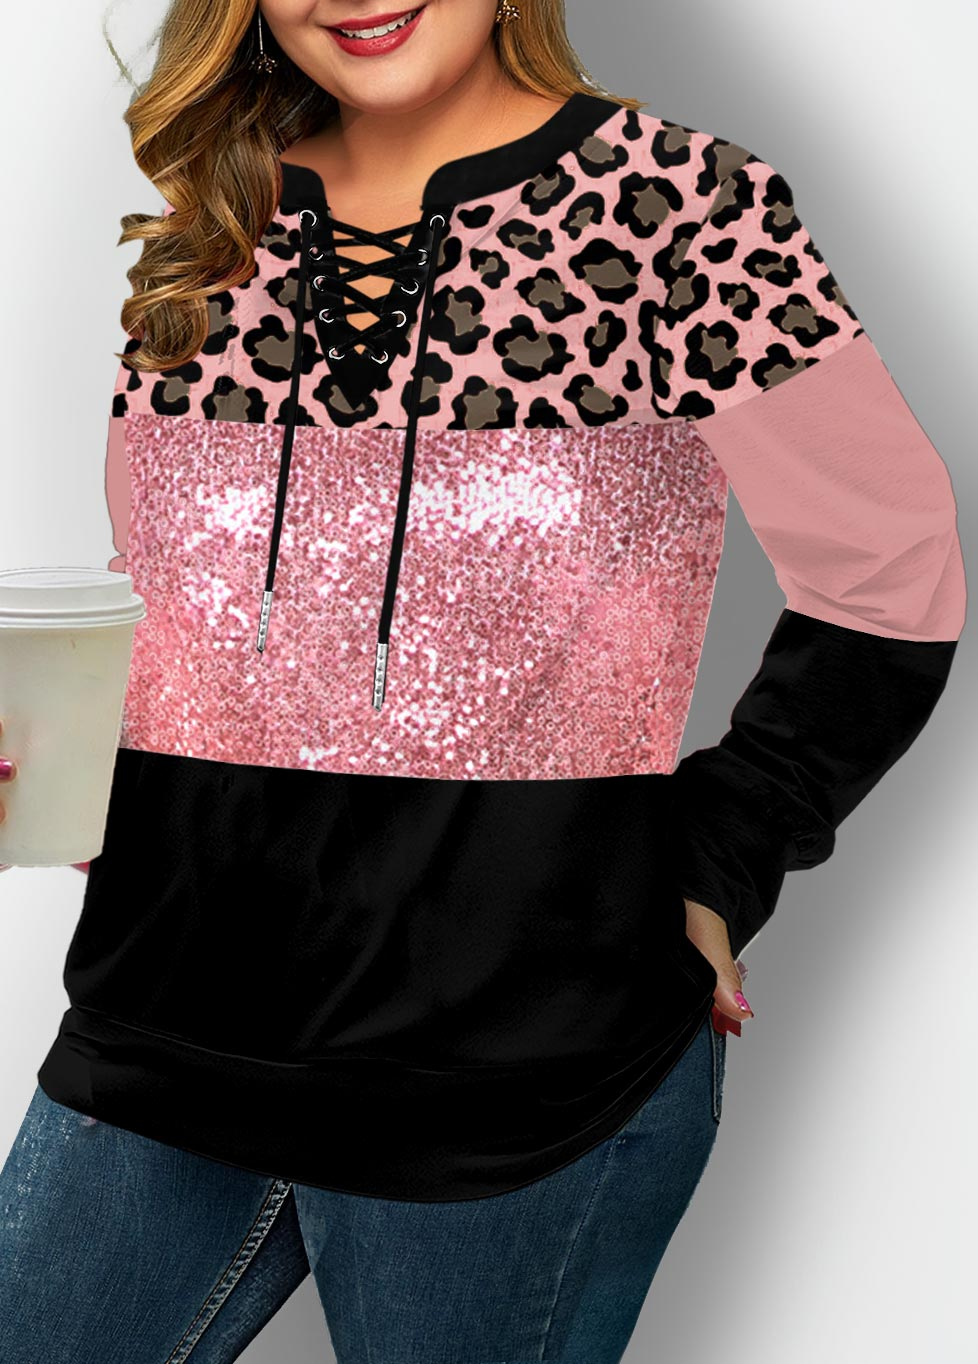 ROTITA Plus Size Lace Up Sequin Panel Leopard Sweatshirt